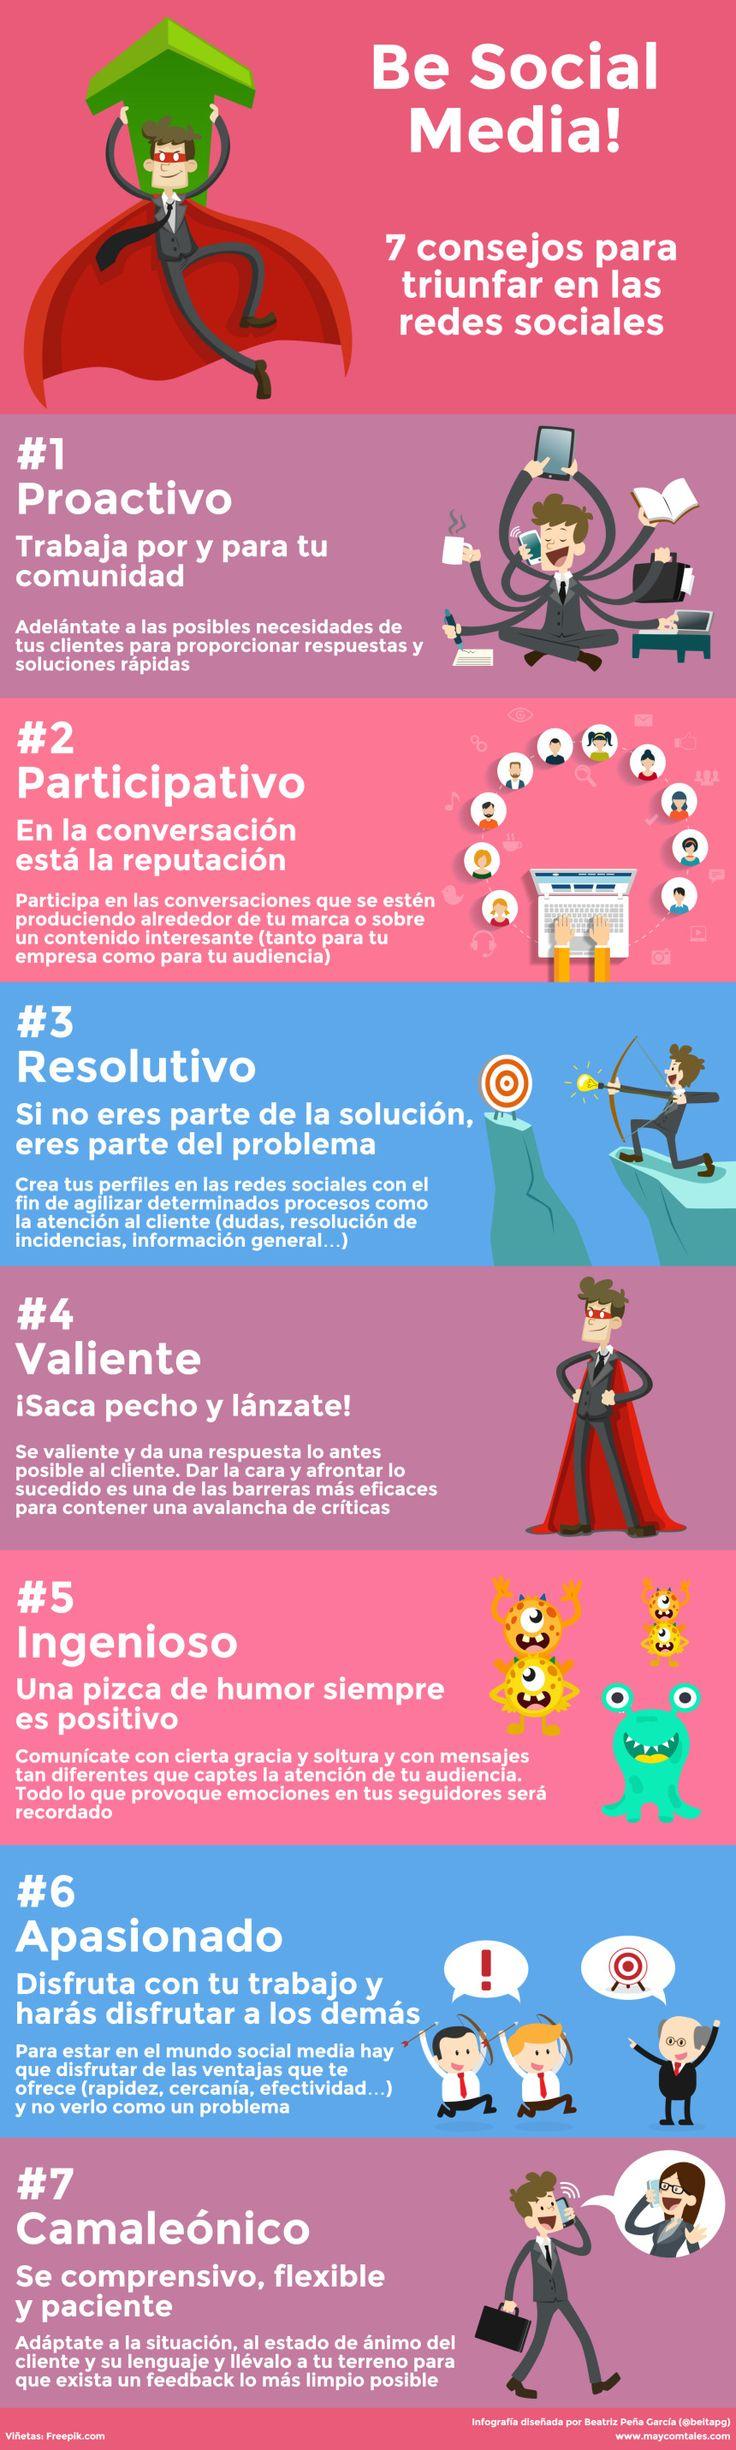 7 consejos para triunfar en Redes Sociales #infografia #infographic #socialmedia